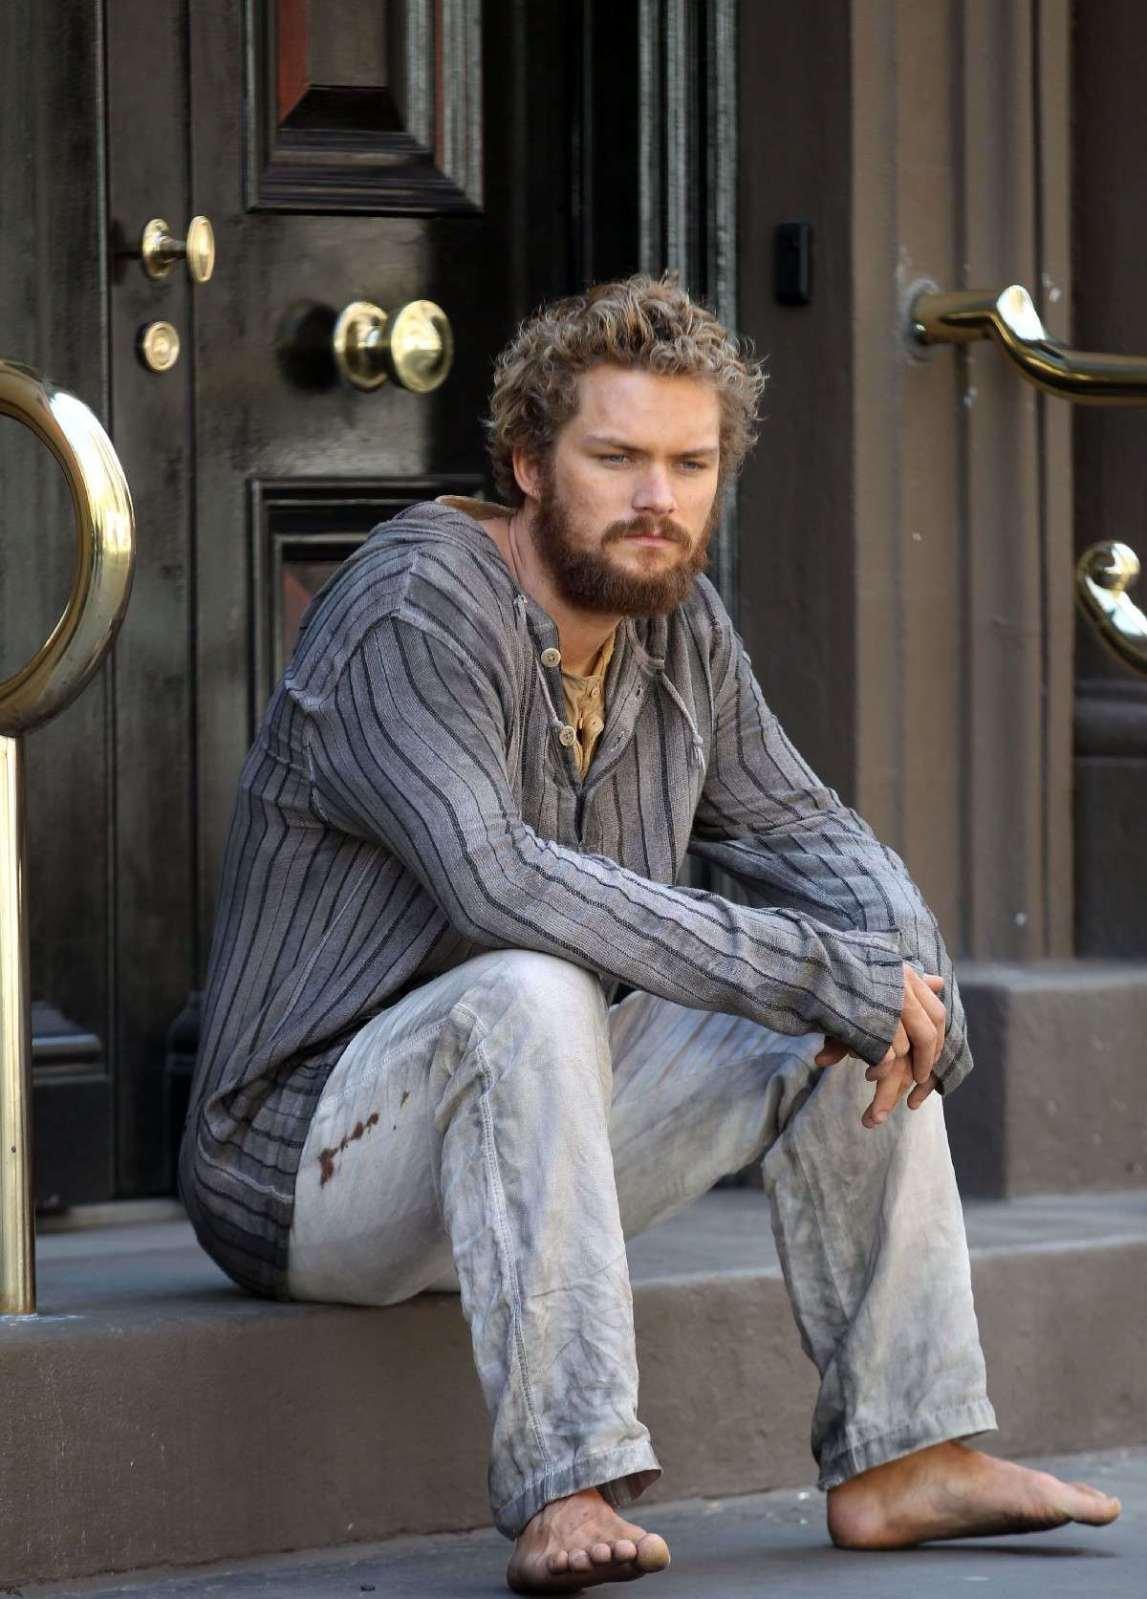 Serie TV News: Carrie-Anne Moss in Iron First, Ewan McGregor in Fargo 3